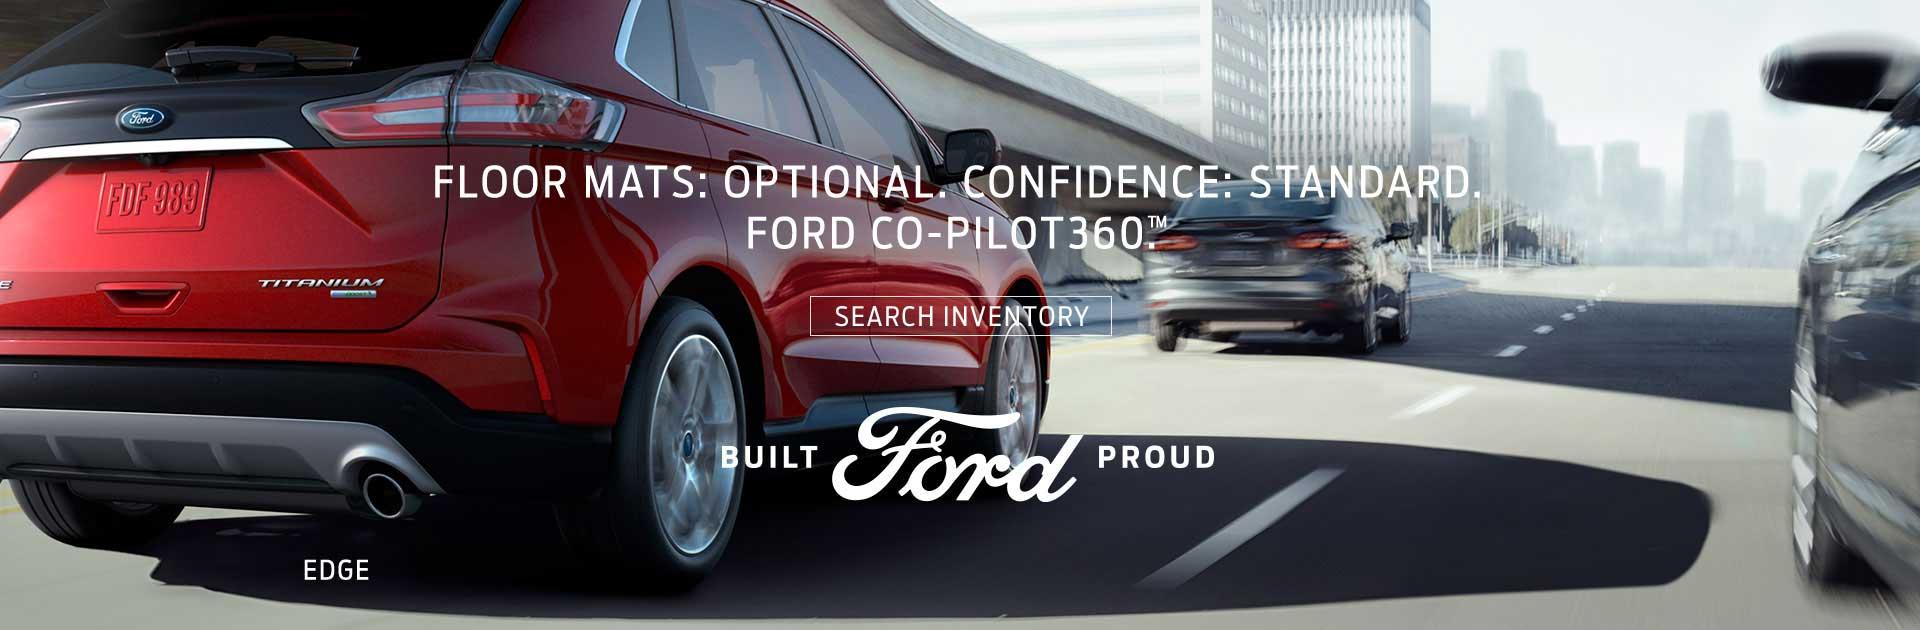 New Used Ford Dealer In Oklahoma City Ok Reynolds Of Okc Inc 89 F 250 Fuel Filter Shop Make Model